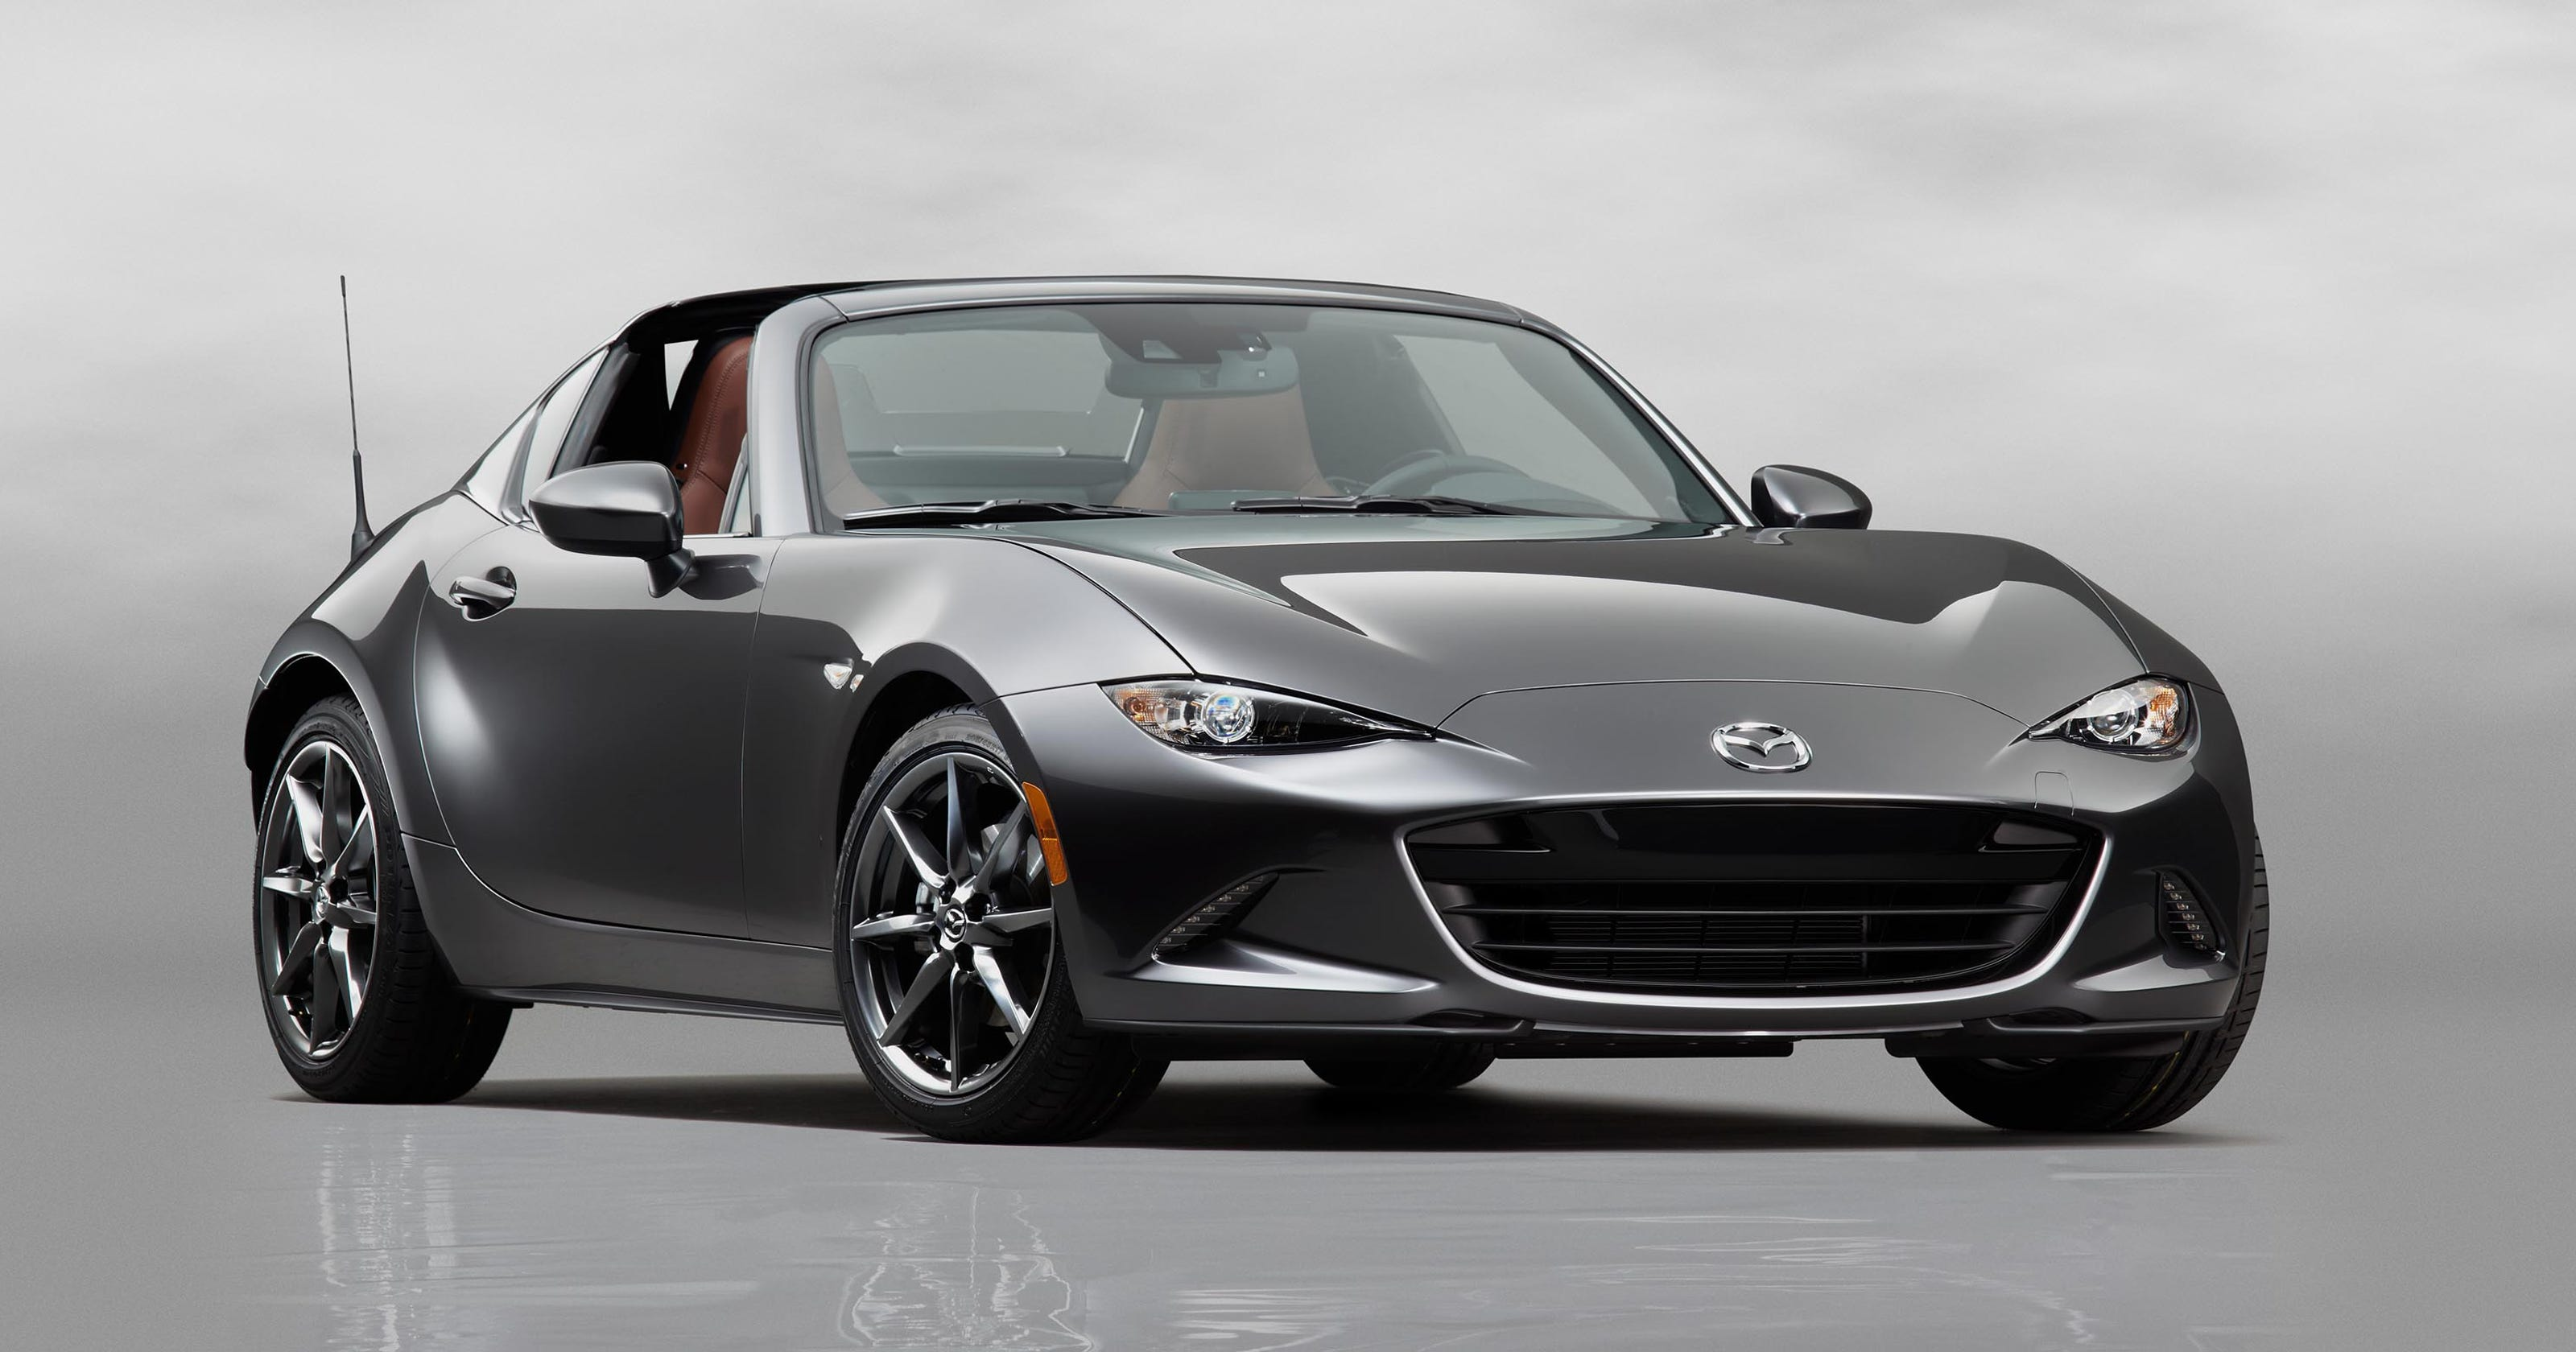 Auto Review Mazda Miata Mx 5 Rf Is More Than Just A Seasonal Hardtop Convertible